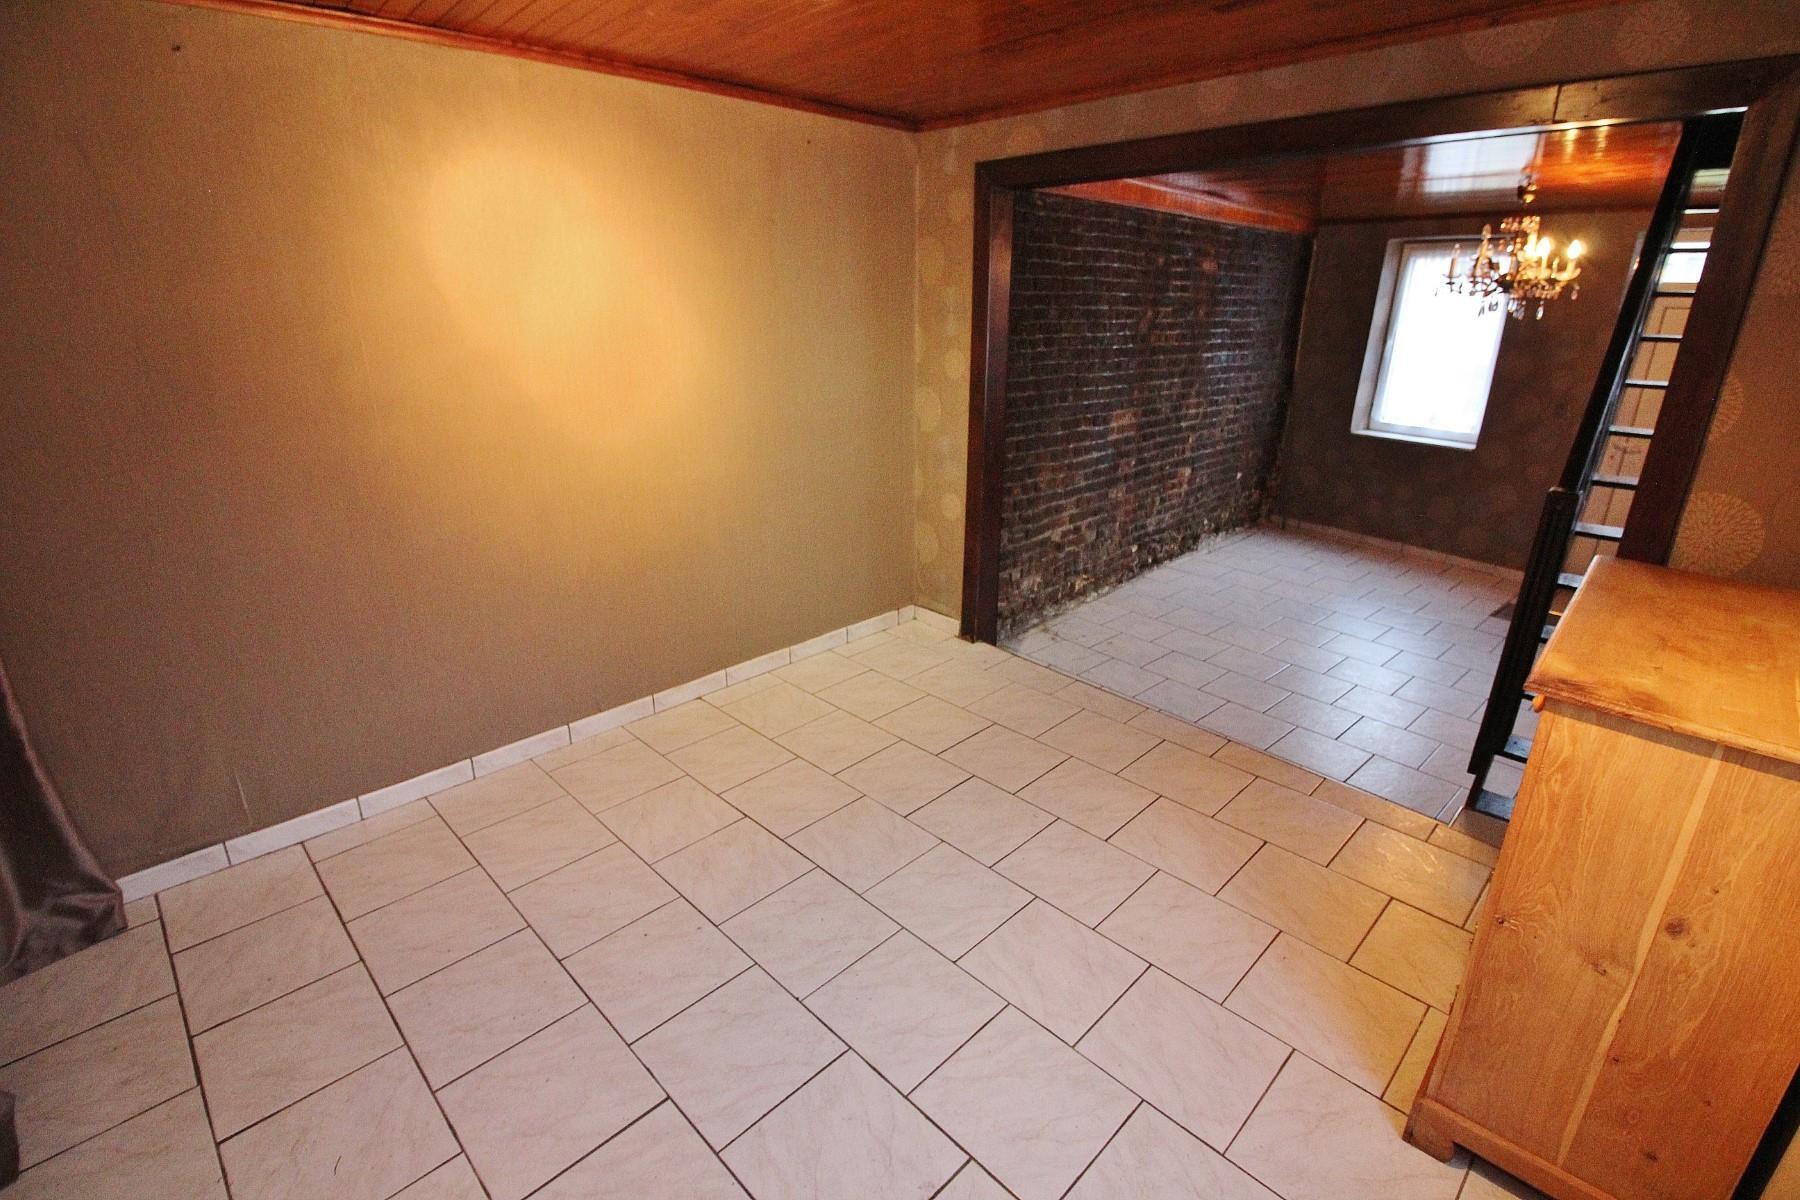 Maison - Beyne-Heusay Bellaire - #3946189-3